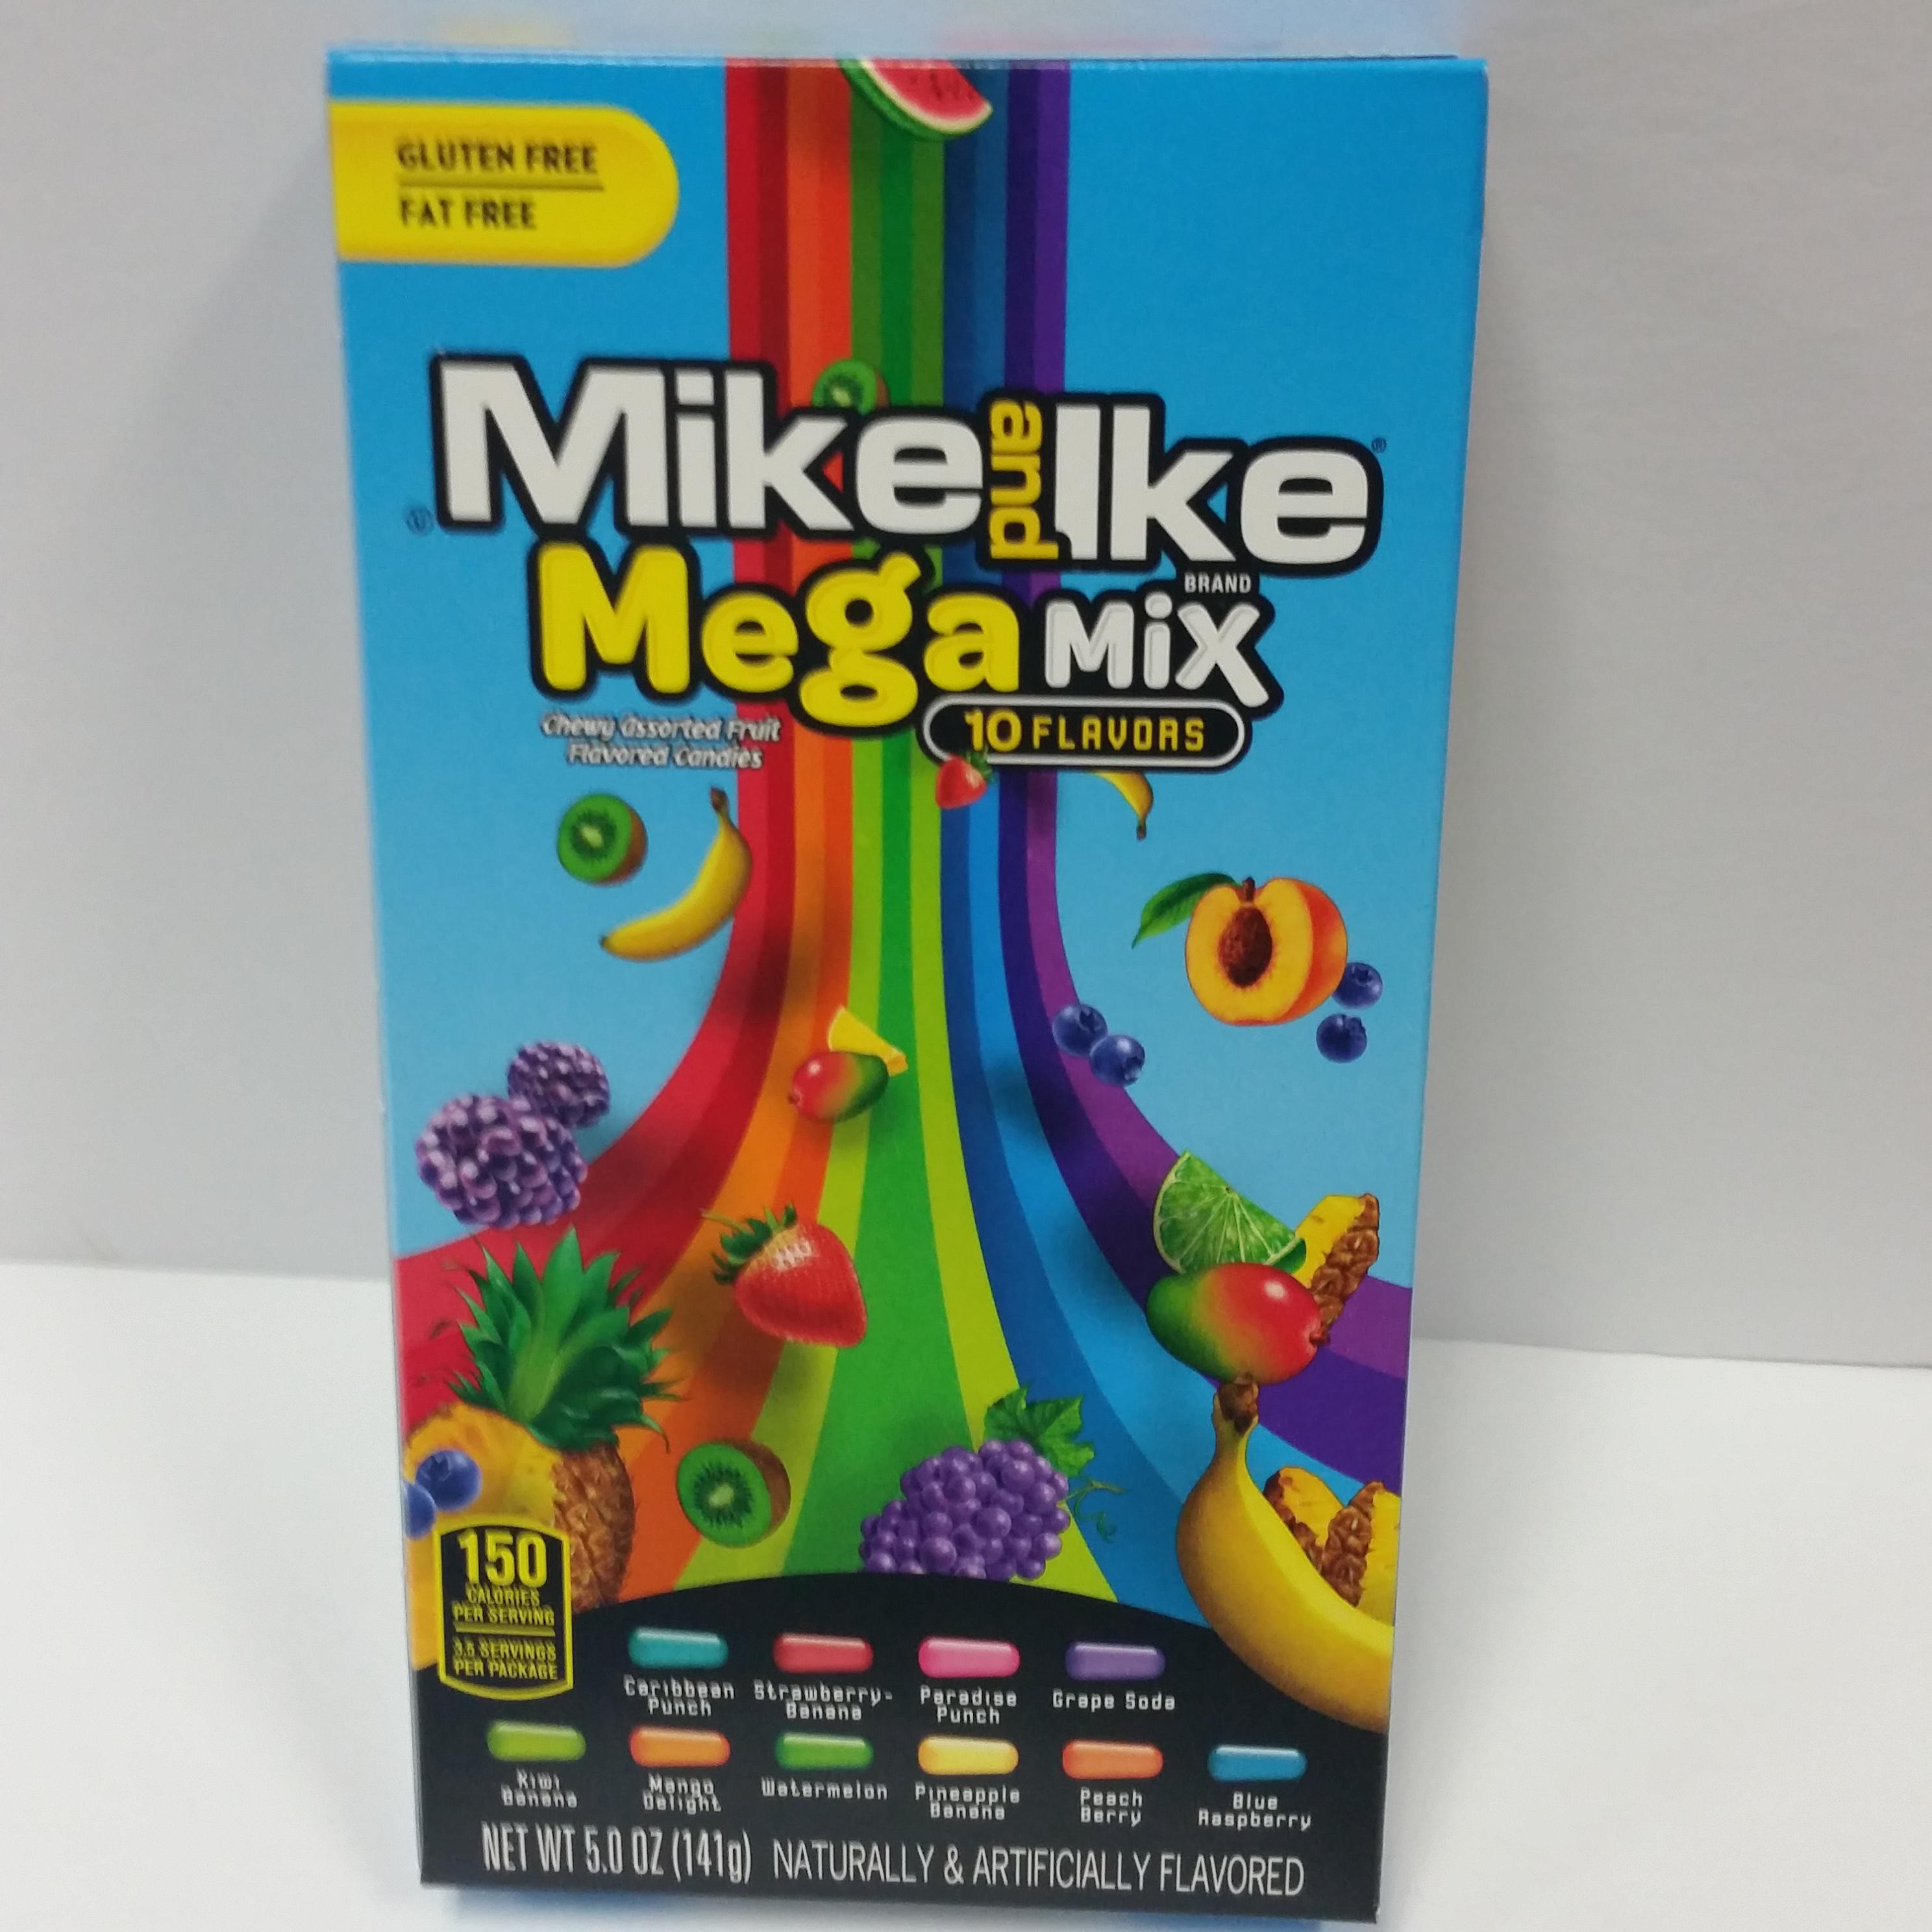 Mike And Ike Mike & Ike Megamix 10 Flv 5oz